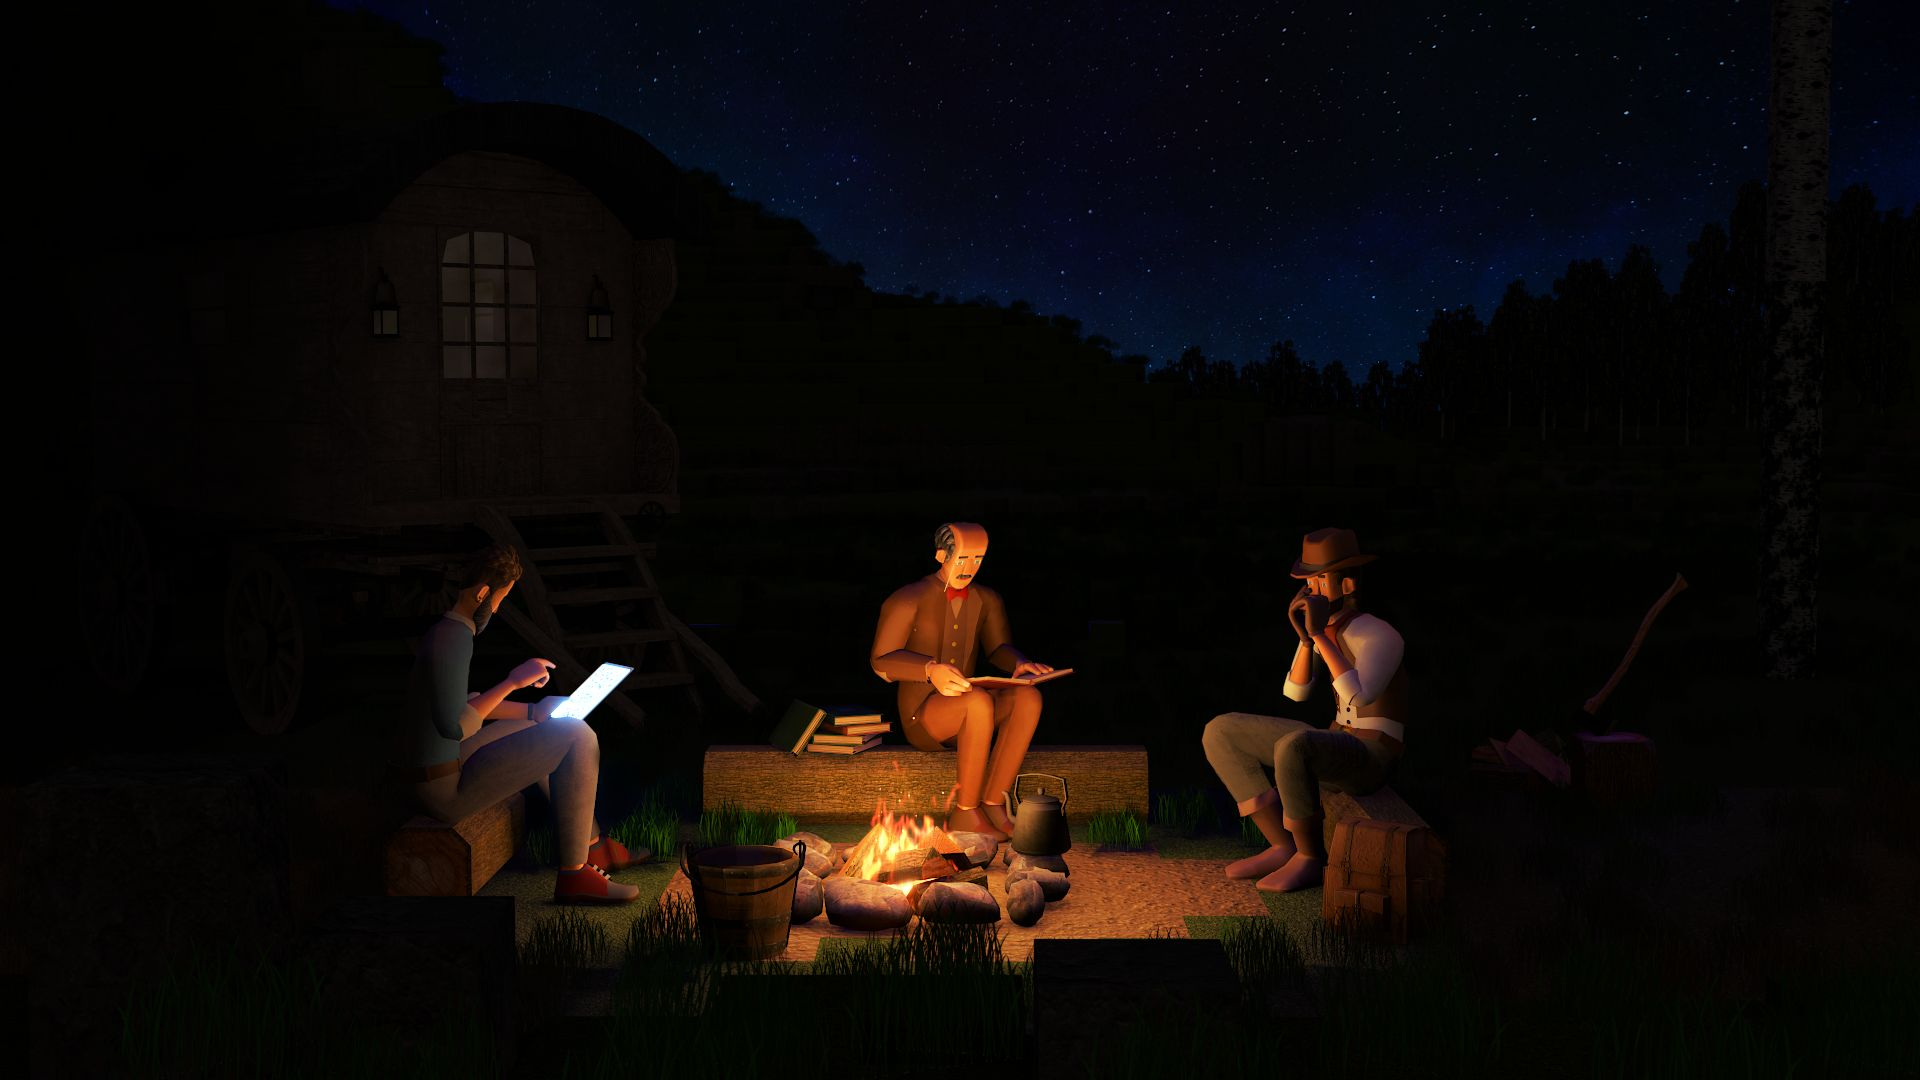 1080p campfire scene website v4